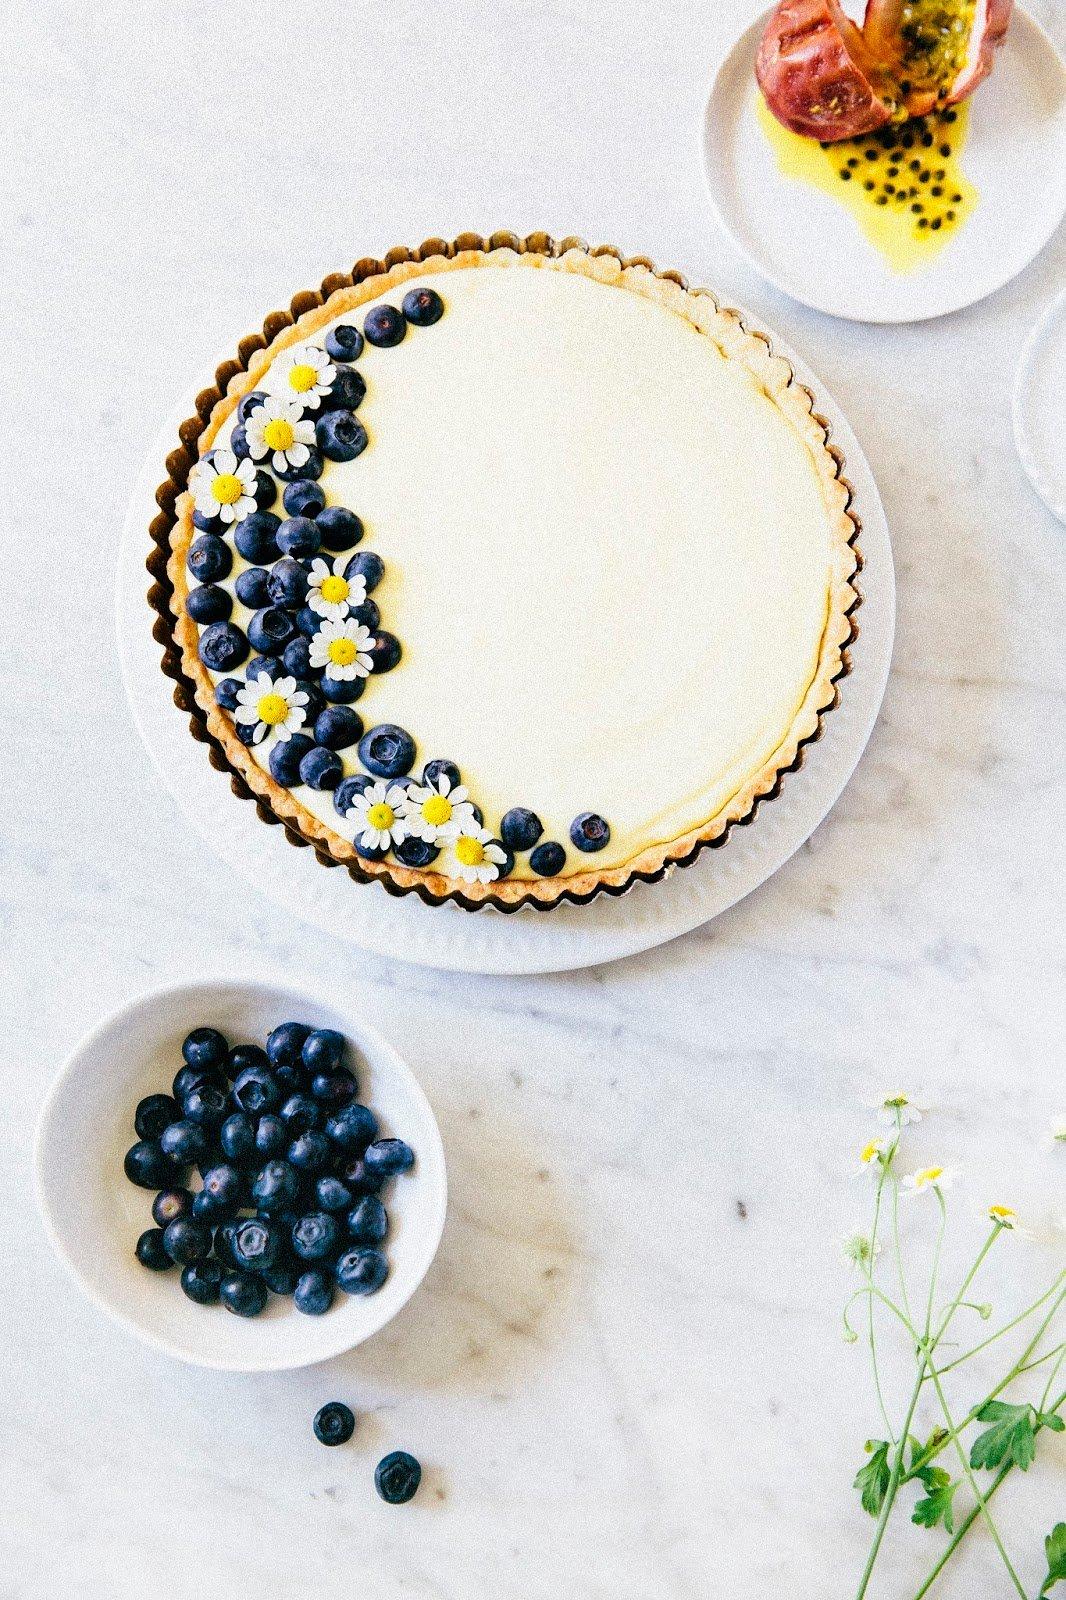 http://www.hummingbirdhigh.com/2016/07/passionfruit-and-blueberry-cream-tart.html